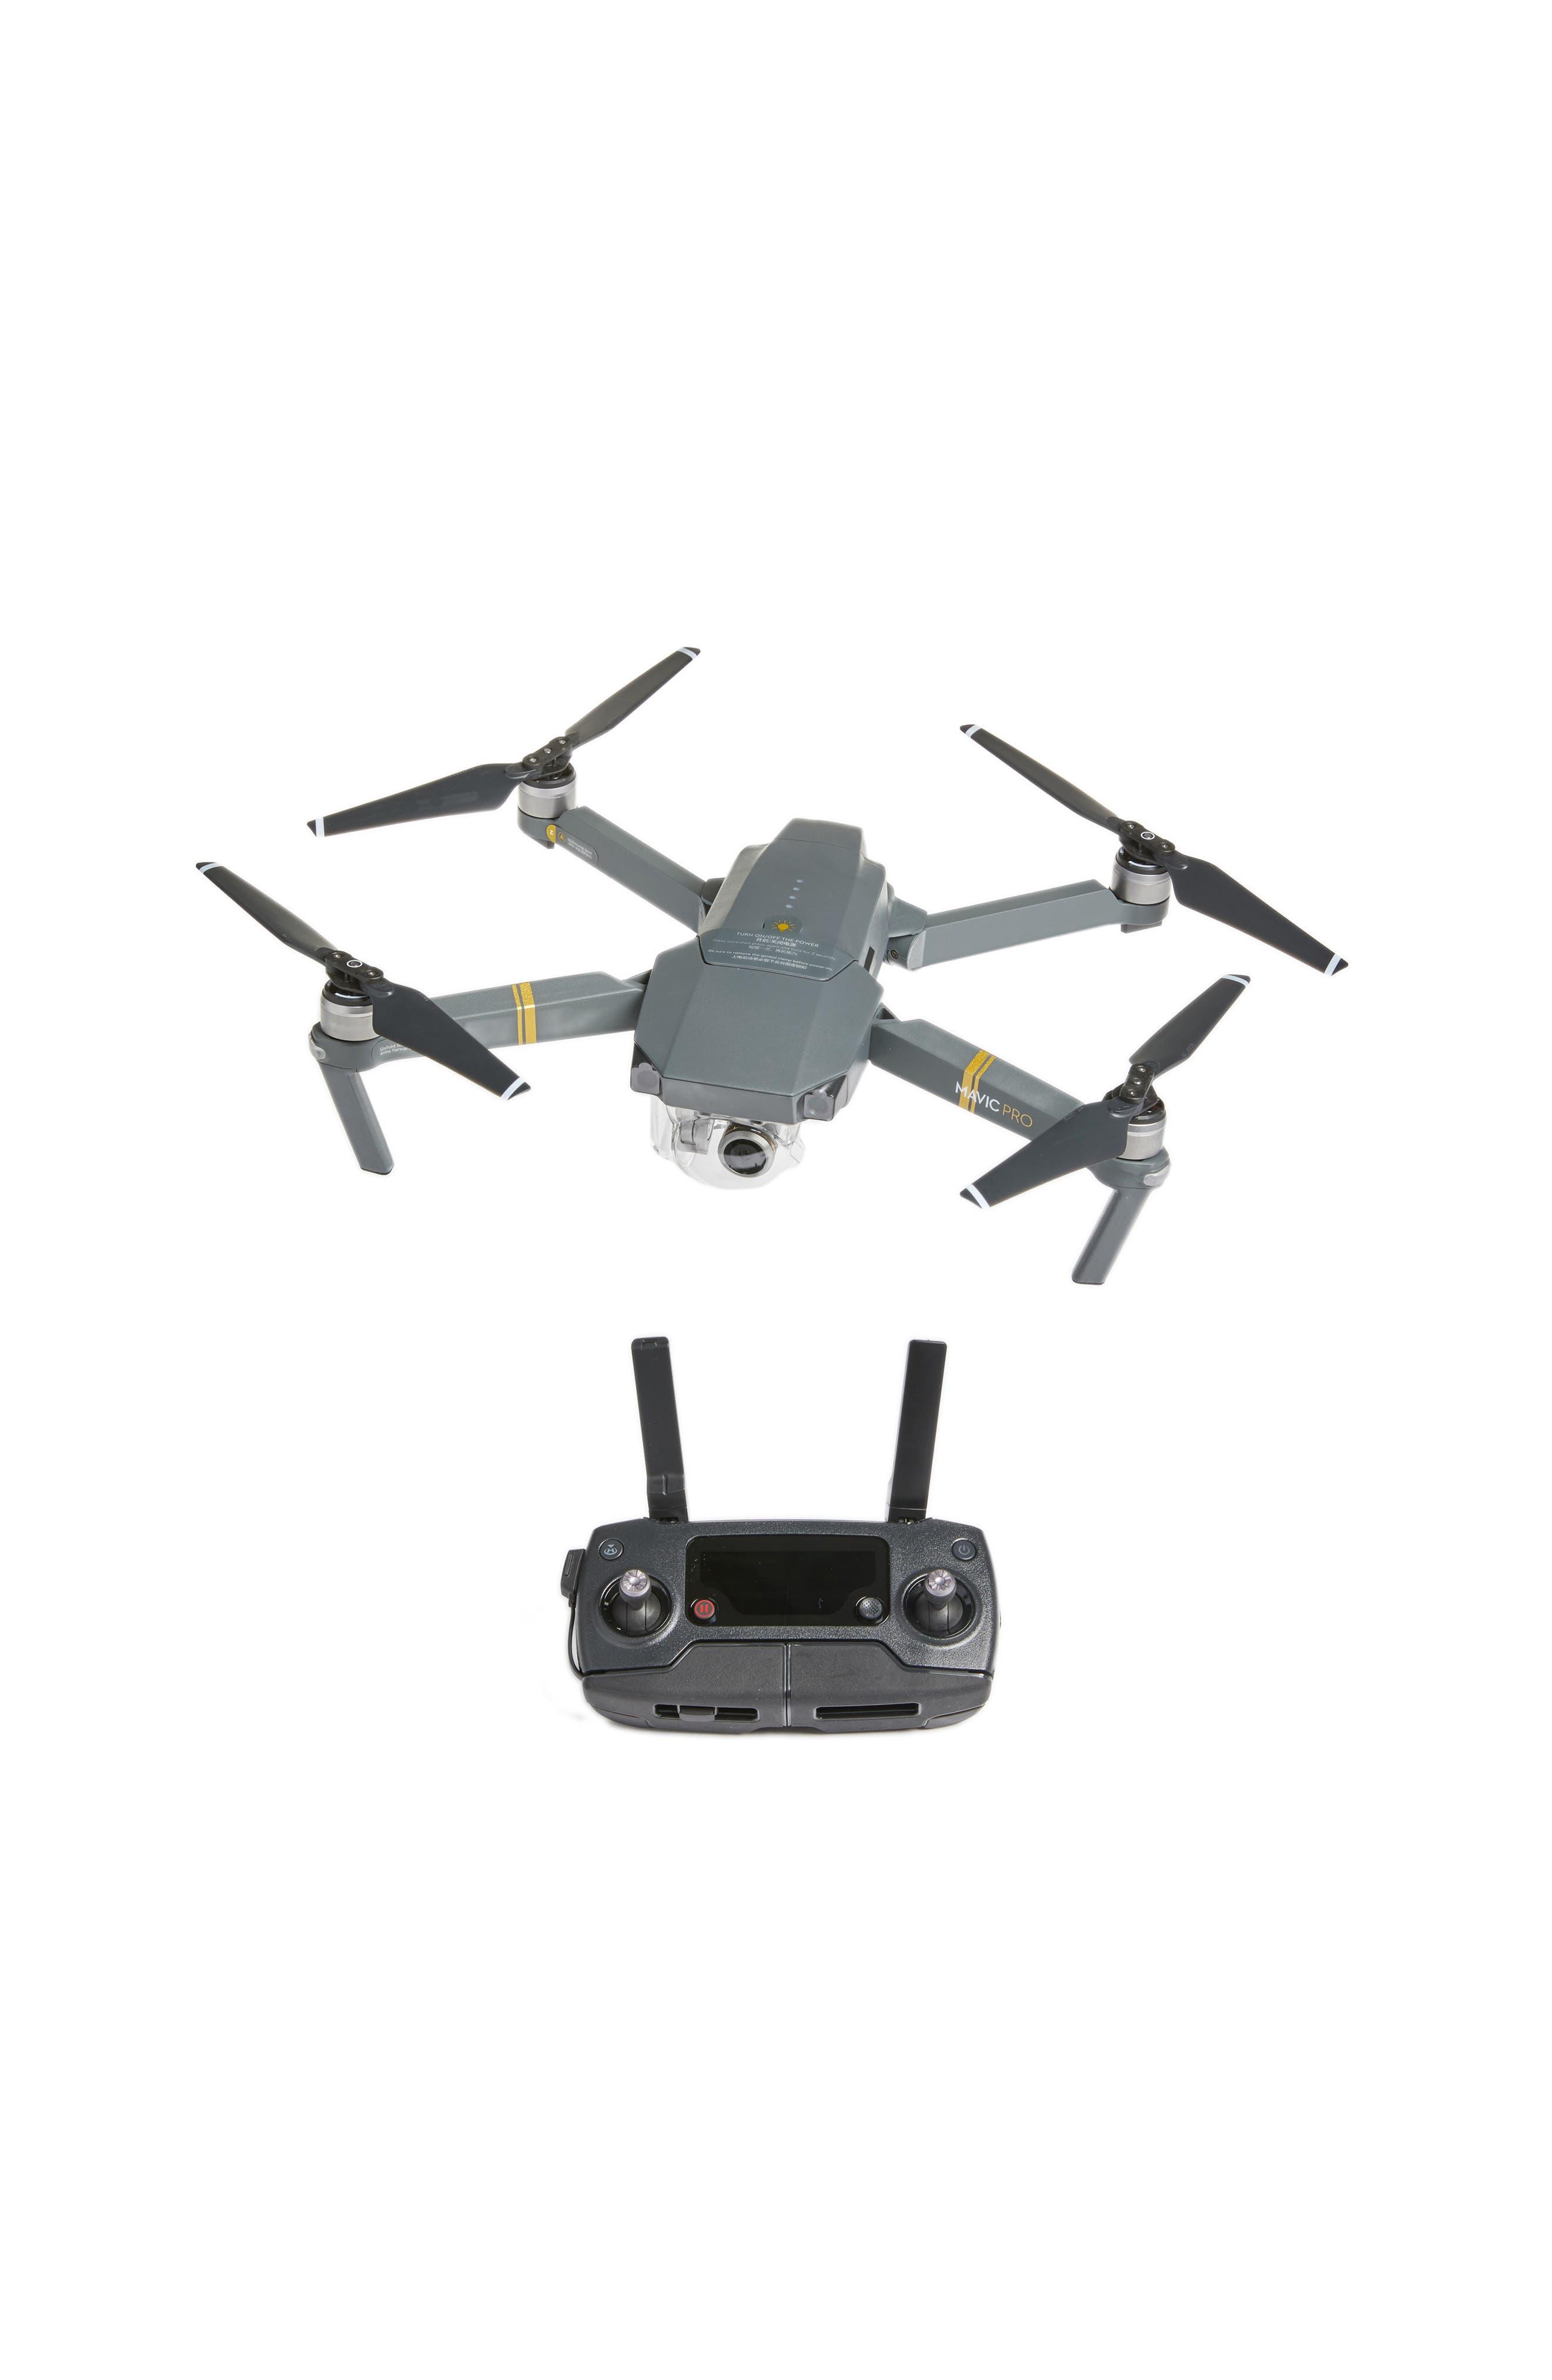 Mavic Pro Foldable Flying Quadcopter,                             Main thumbnail 1, color,                             Grey